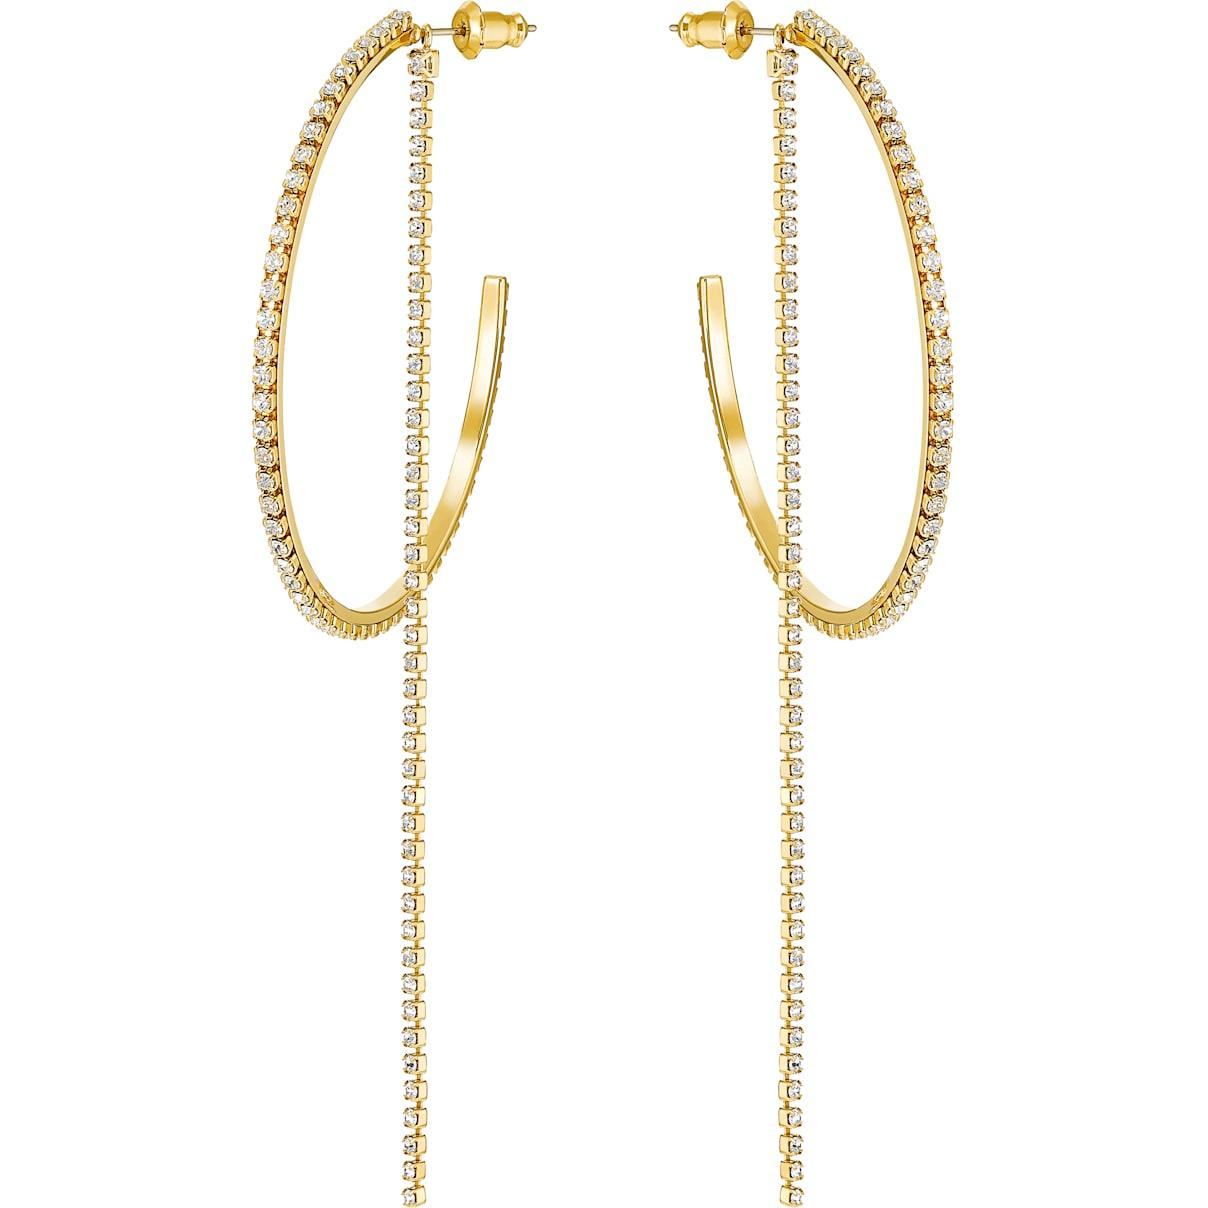 Swarovski Fit Hoop Pierced Earrings, White, Gold-tone plated